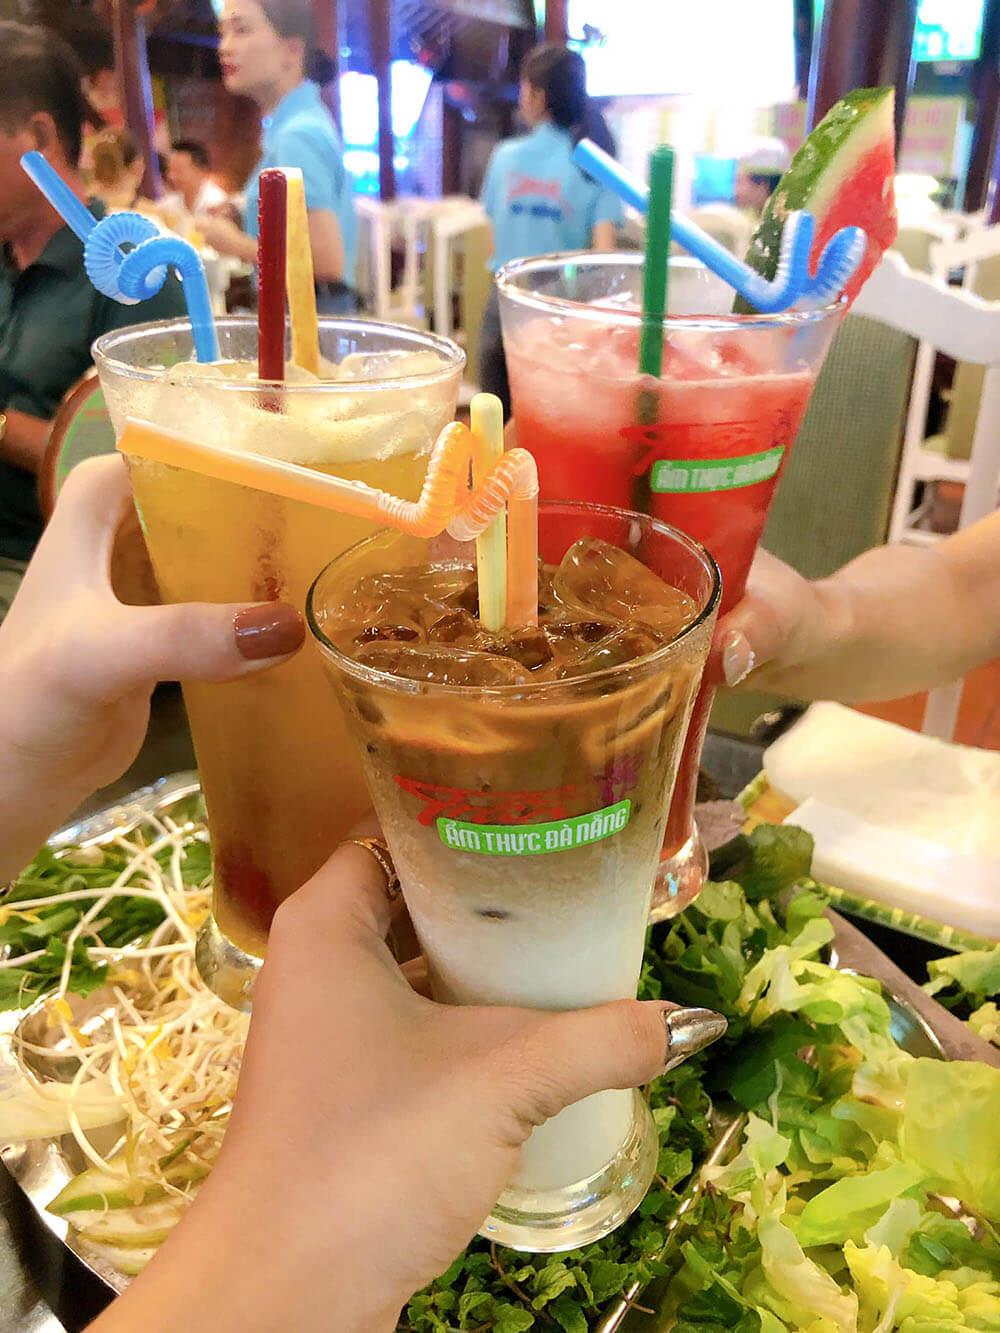 Banh Trang Thit Heo Tran 04 Le Duan Hue Da Nang Hoi An Ninh Binh 7n7d Chi Voi 8 Trieu 01